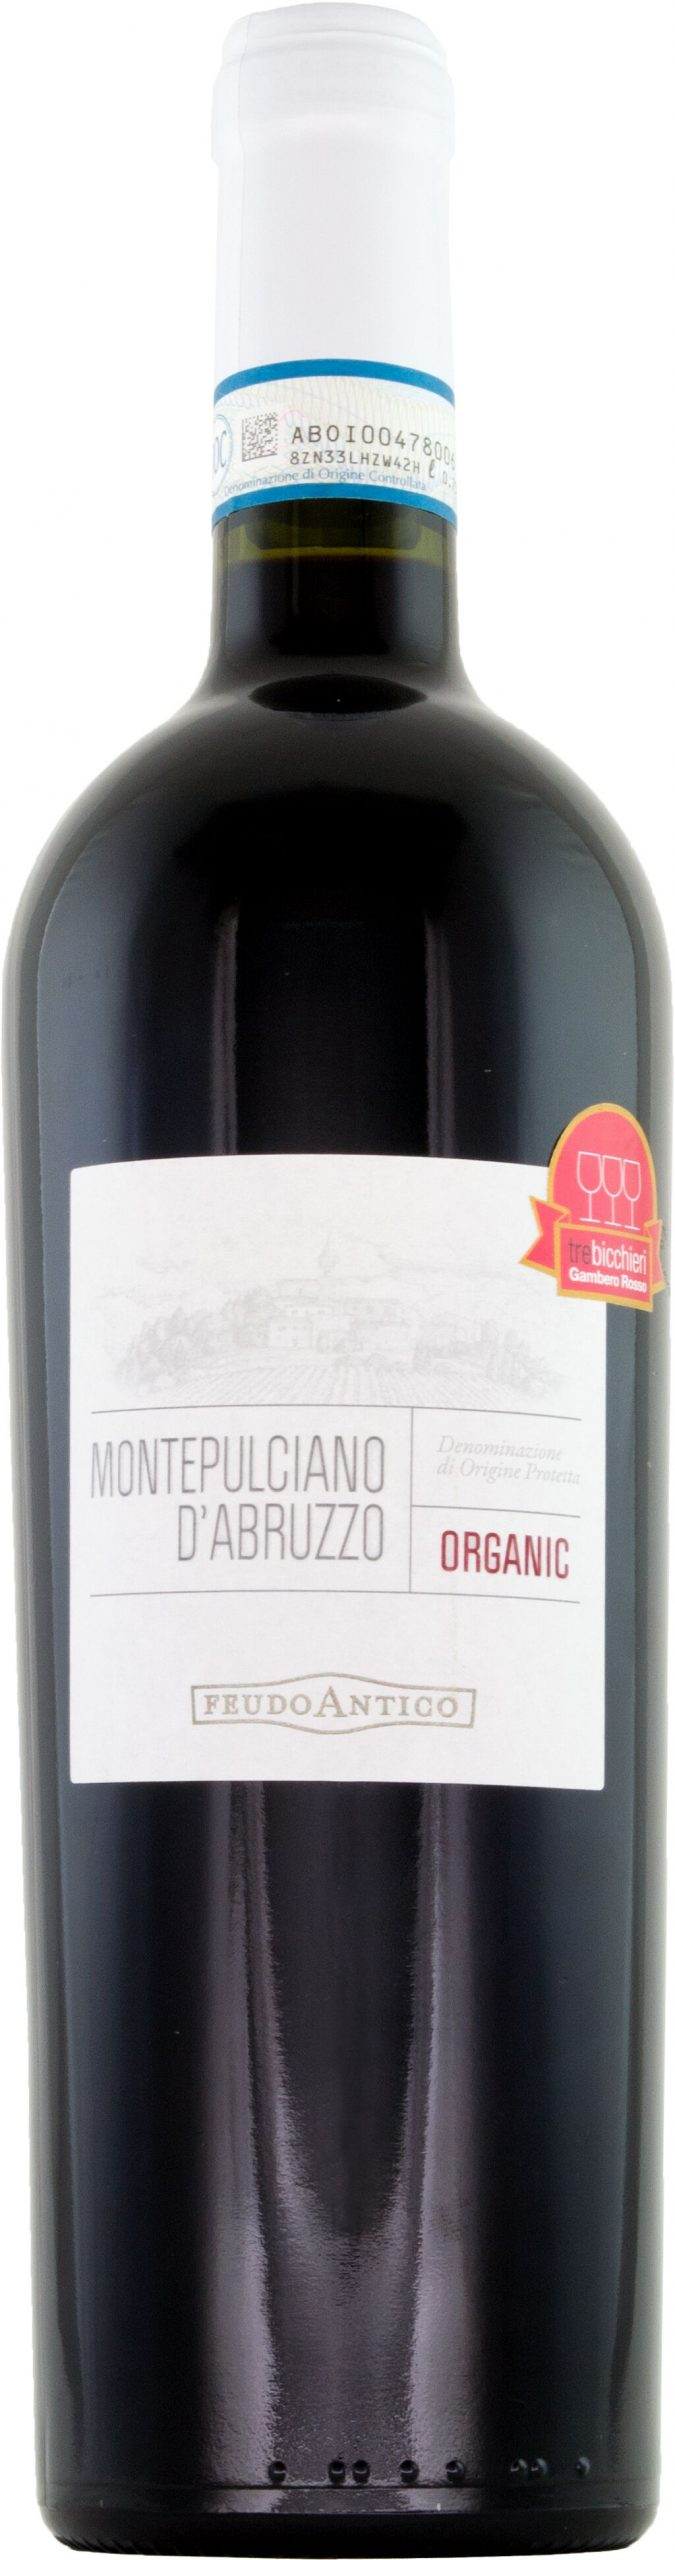 Montepulciano d'Abruzzo Organic